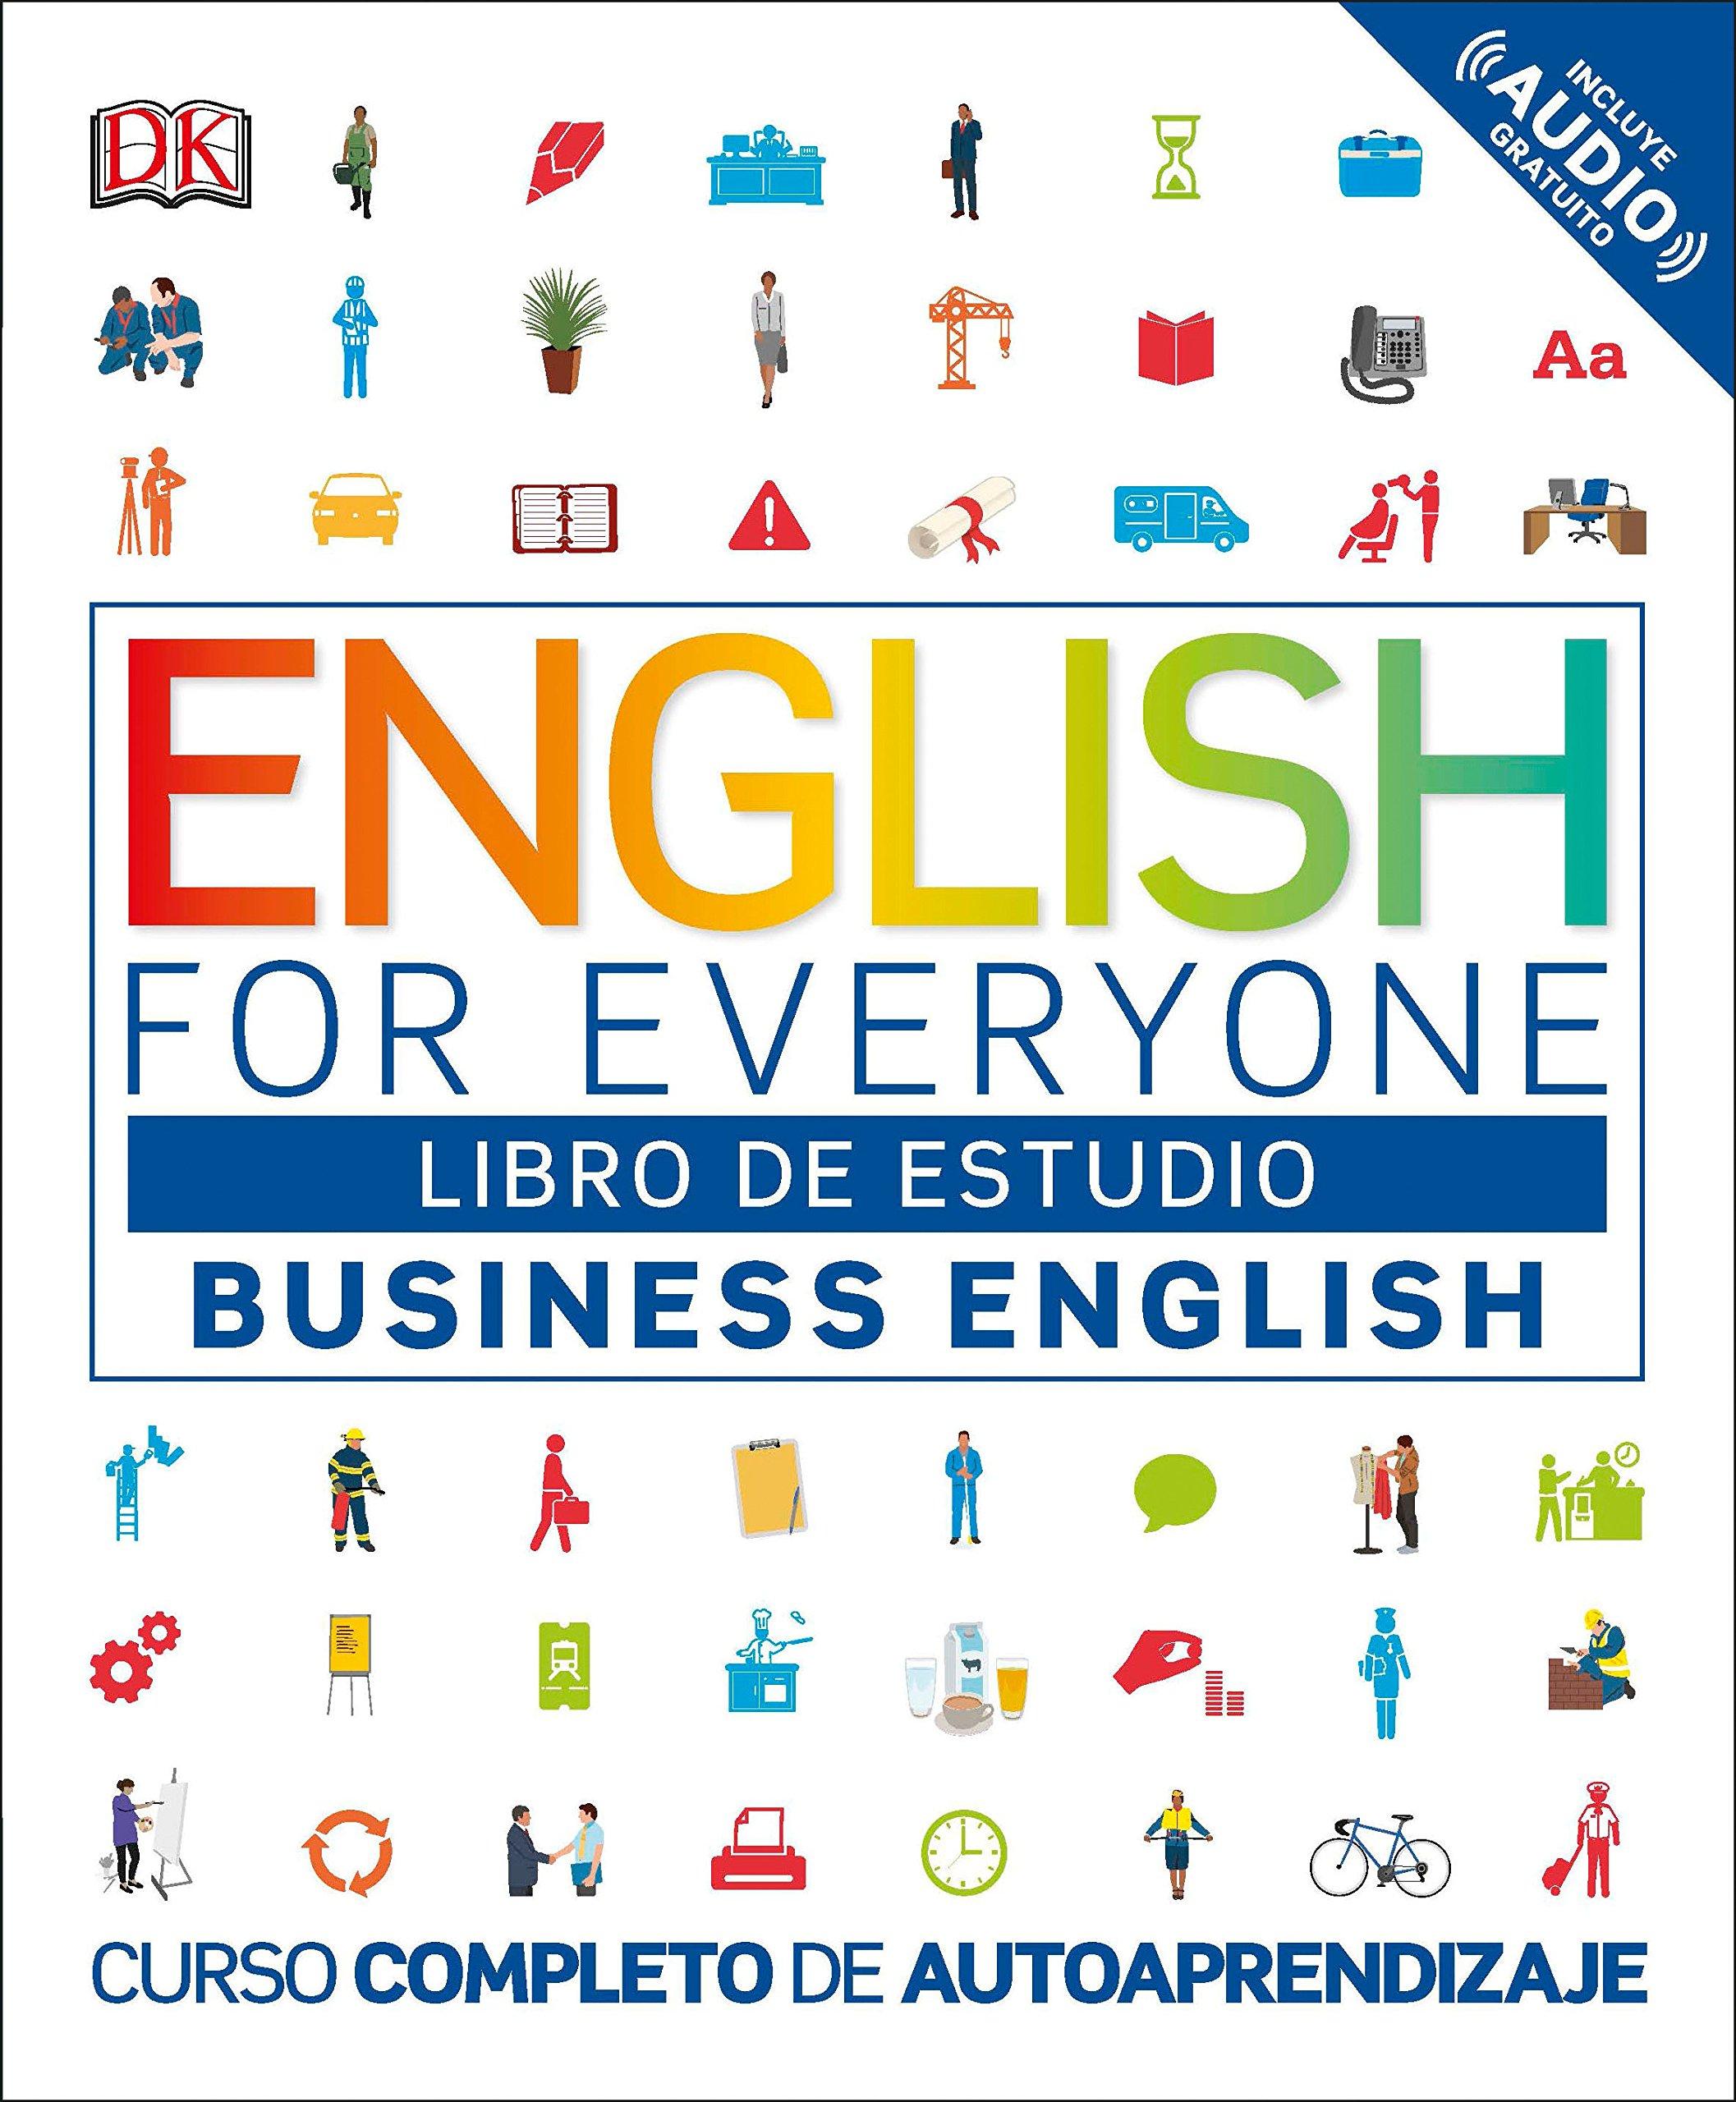 English for Everyone: Business English, Libro de estudio: Curso completo de autoaprendizaje (Spanish Edition) pdf